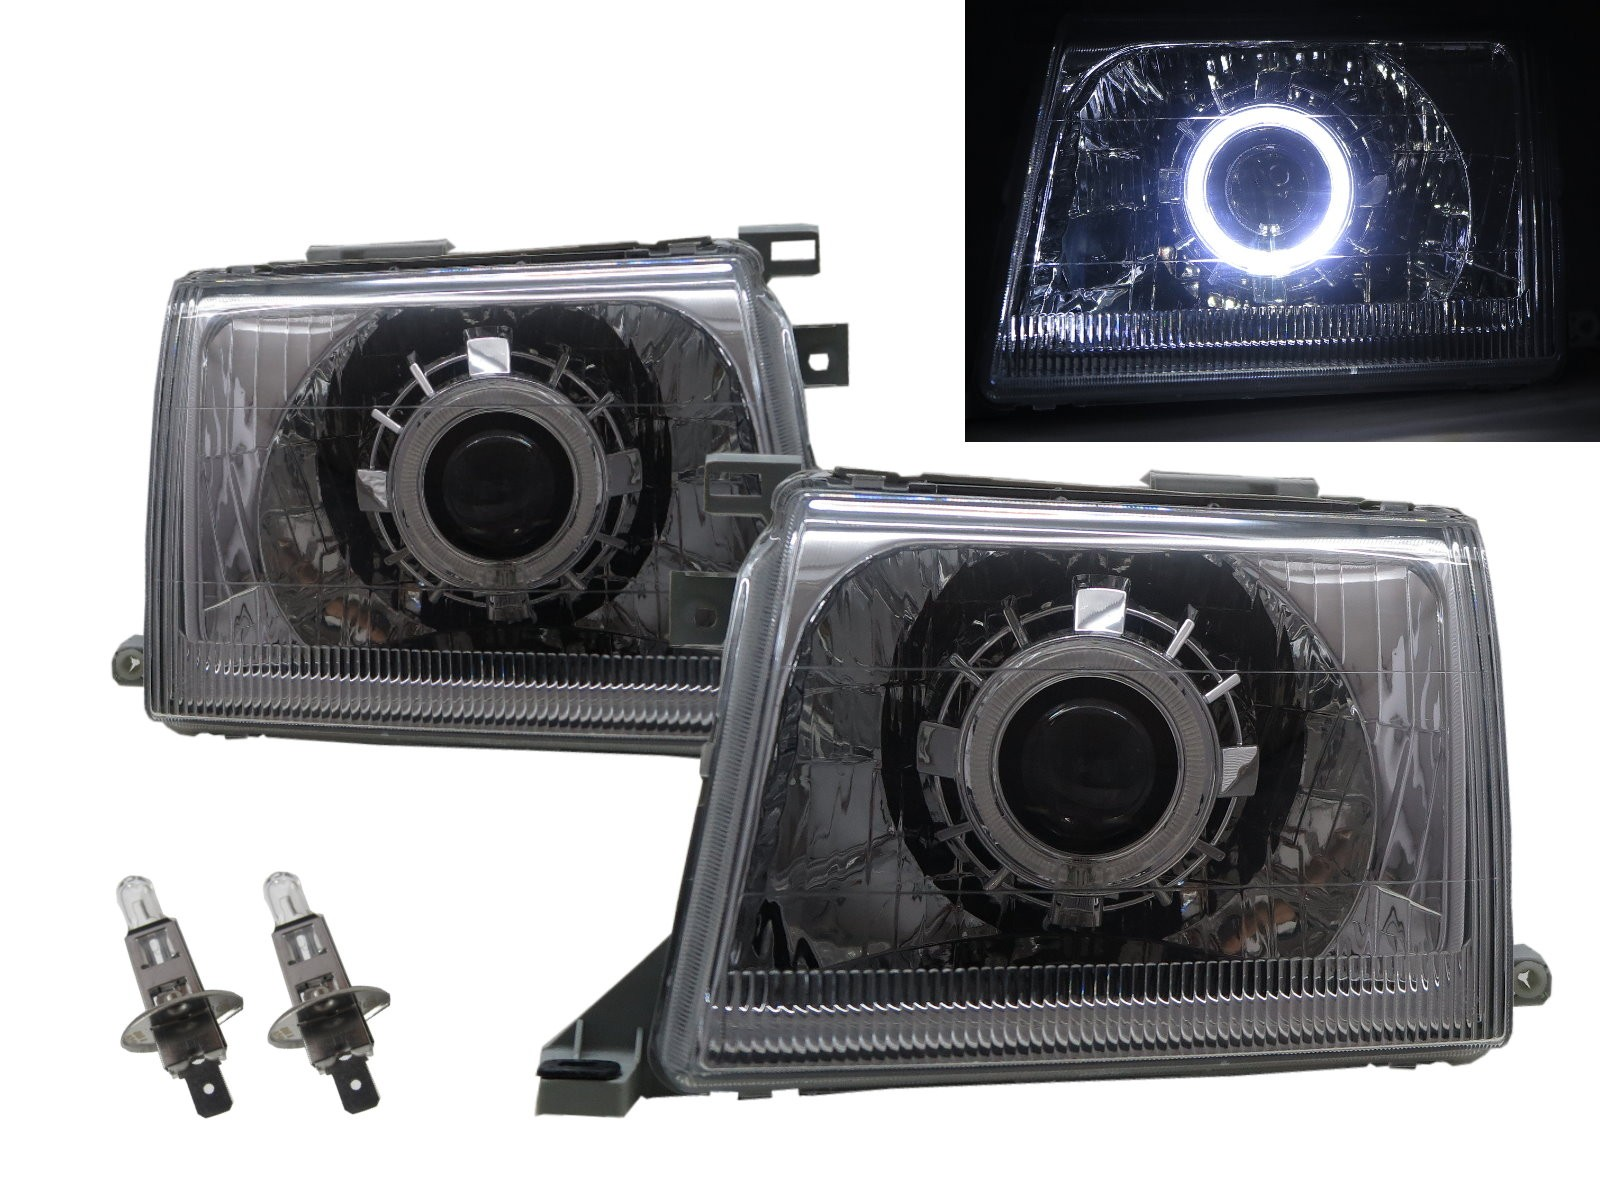 CrazyTheGod Pick UP D22 First generation 2000-2001 Facelift Truck 2D/4D Guide LED Angel-Eye Projector Headlight Headlamp Chrome for NISSAN RHD